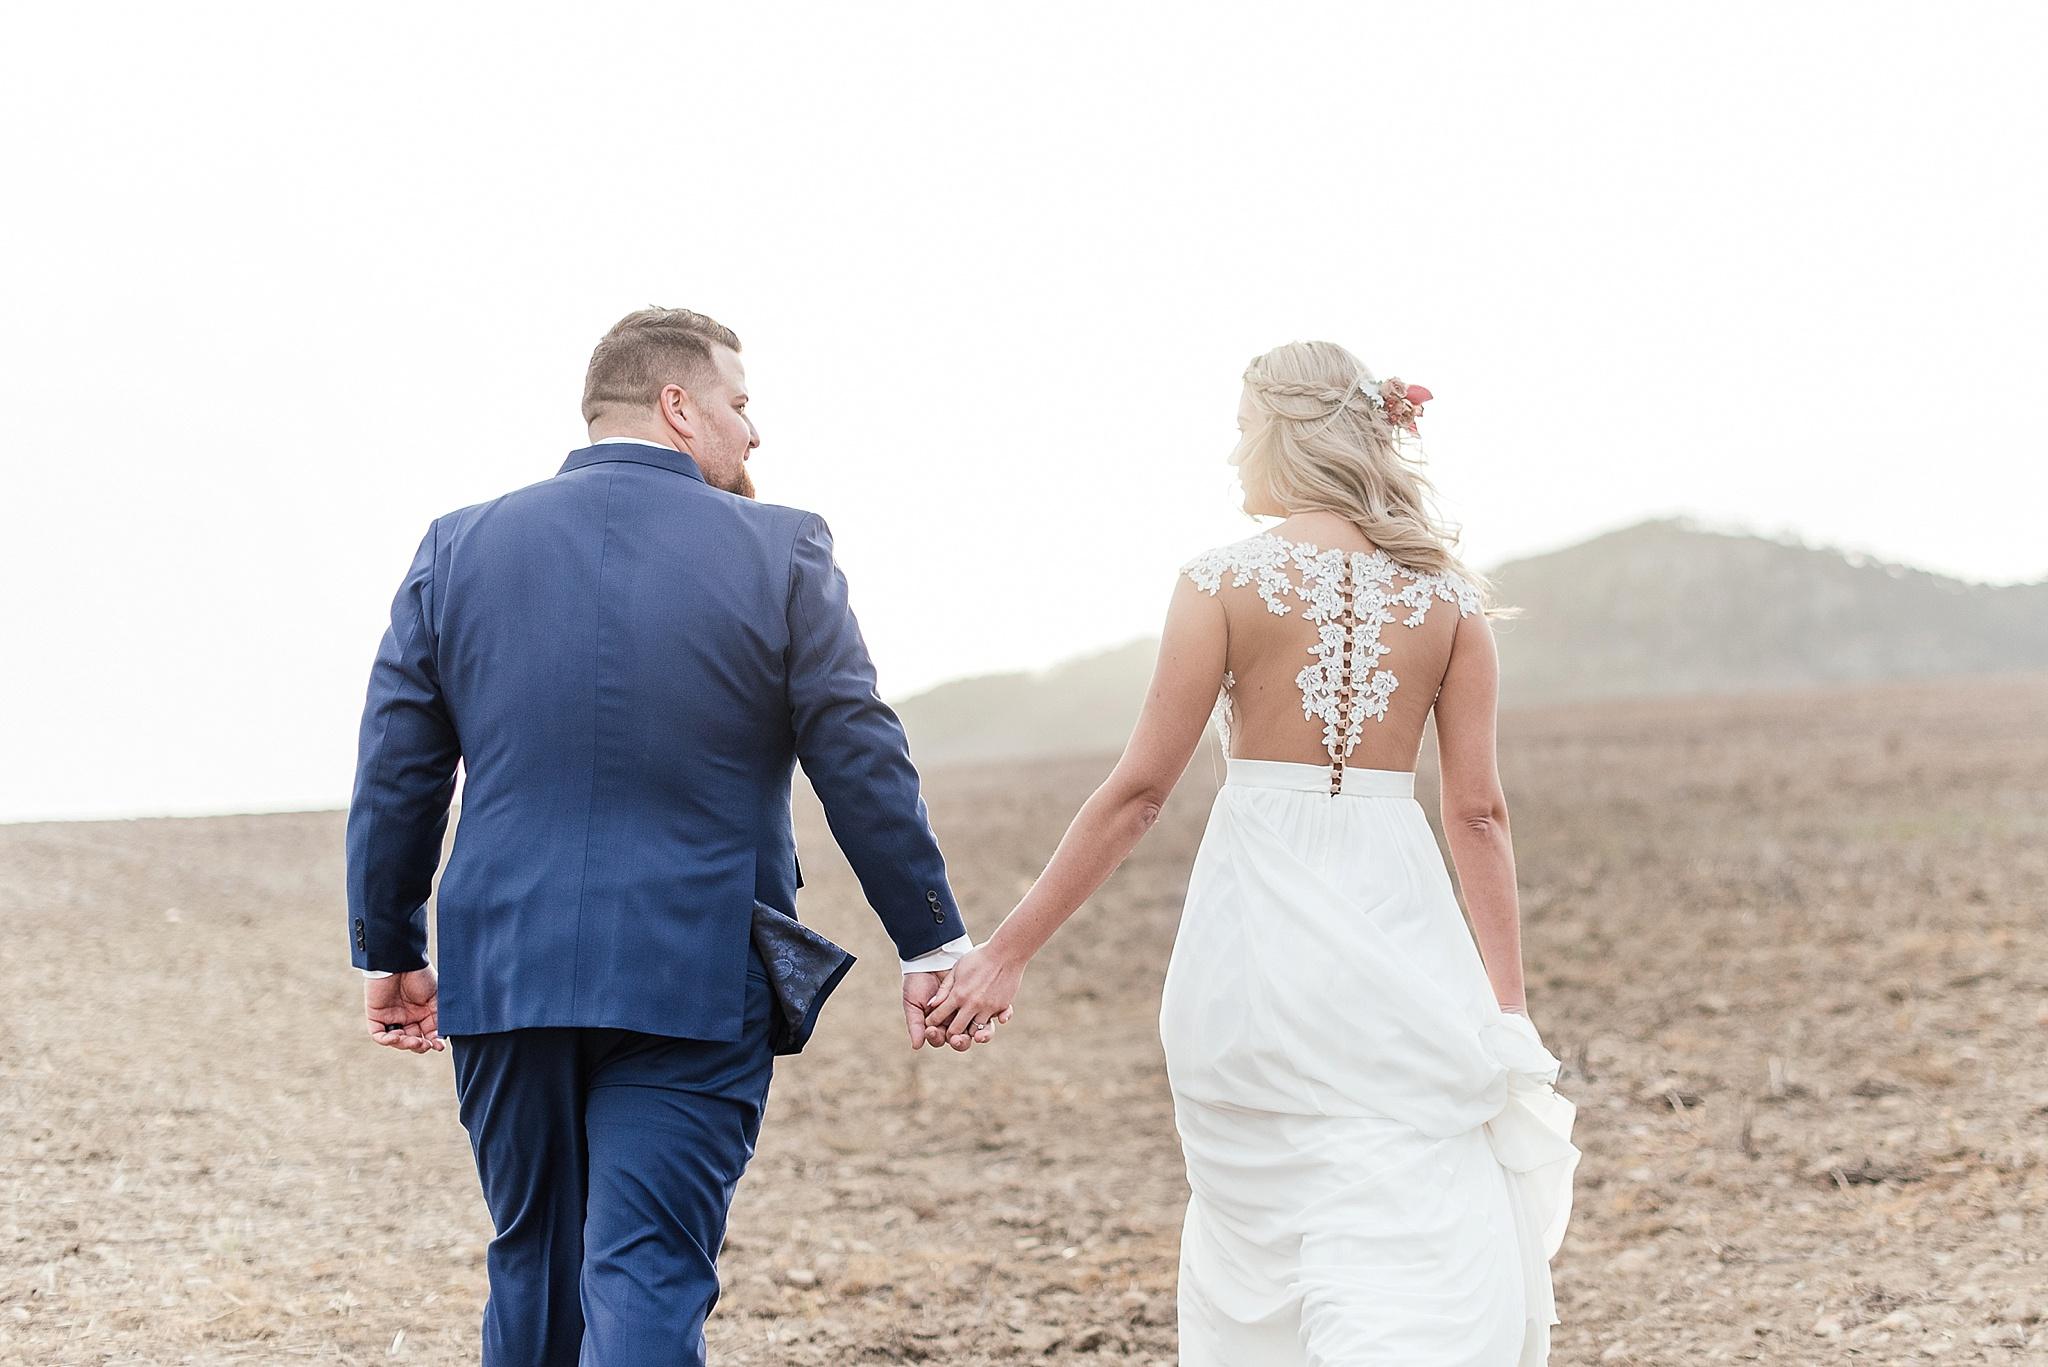 Cape Town Photographer Darren Bester - Die Woud Wedding - Gareth & Roxanne_0034.jpg